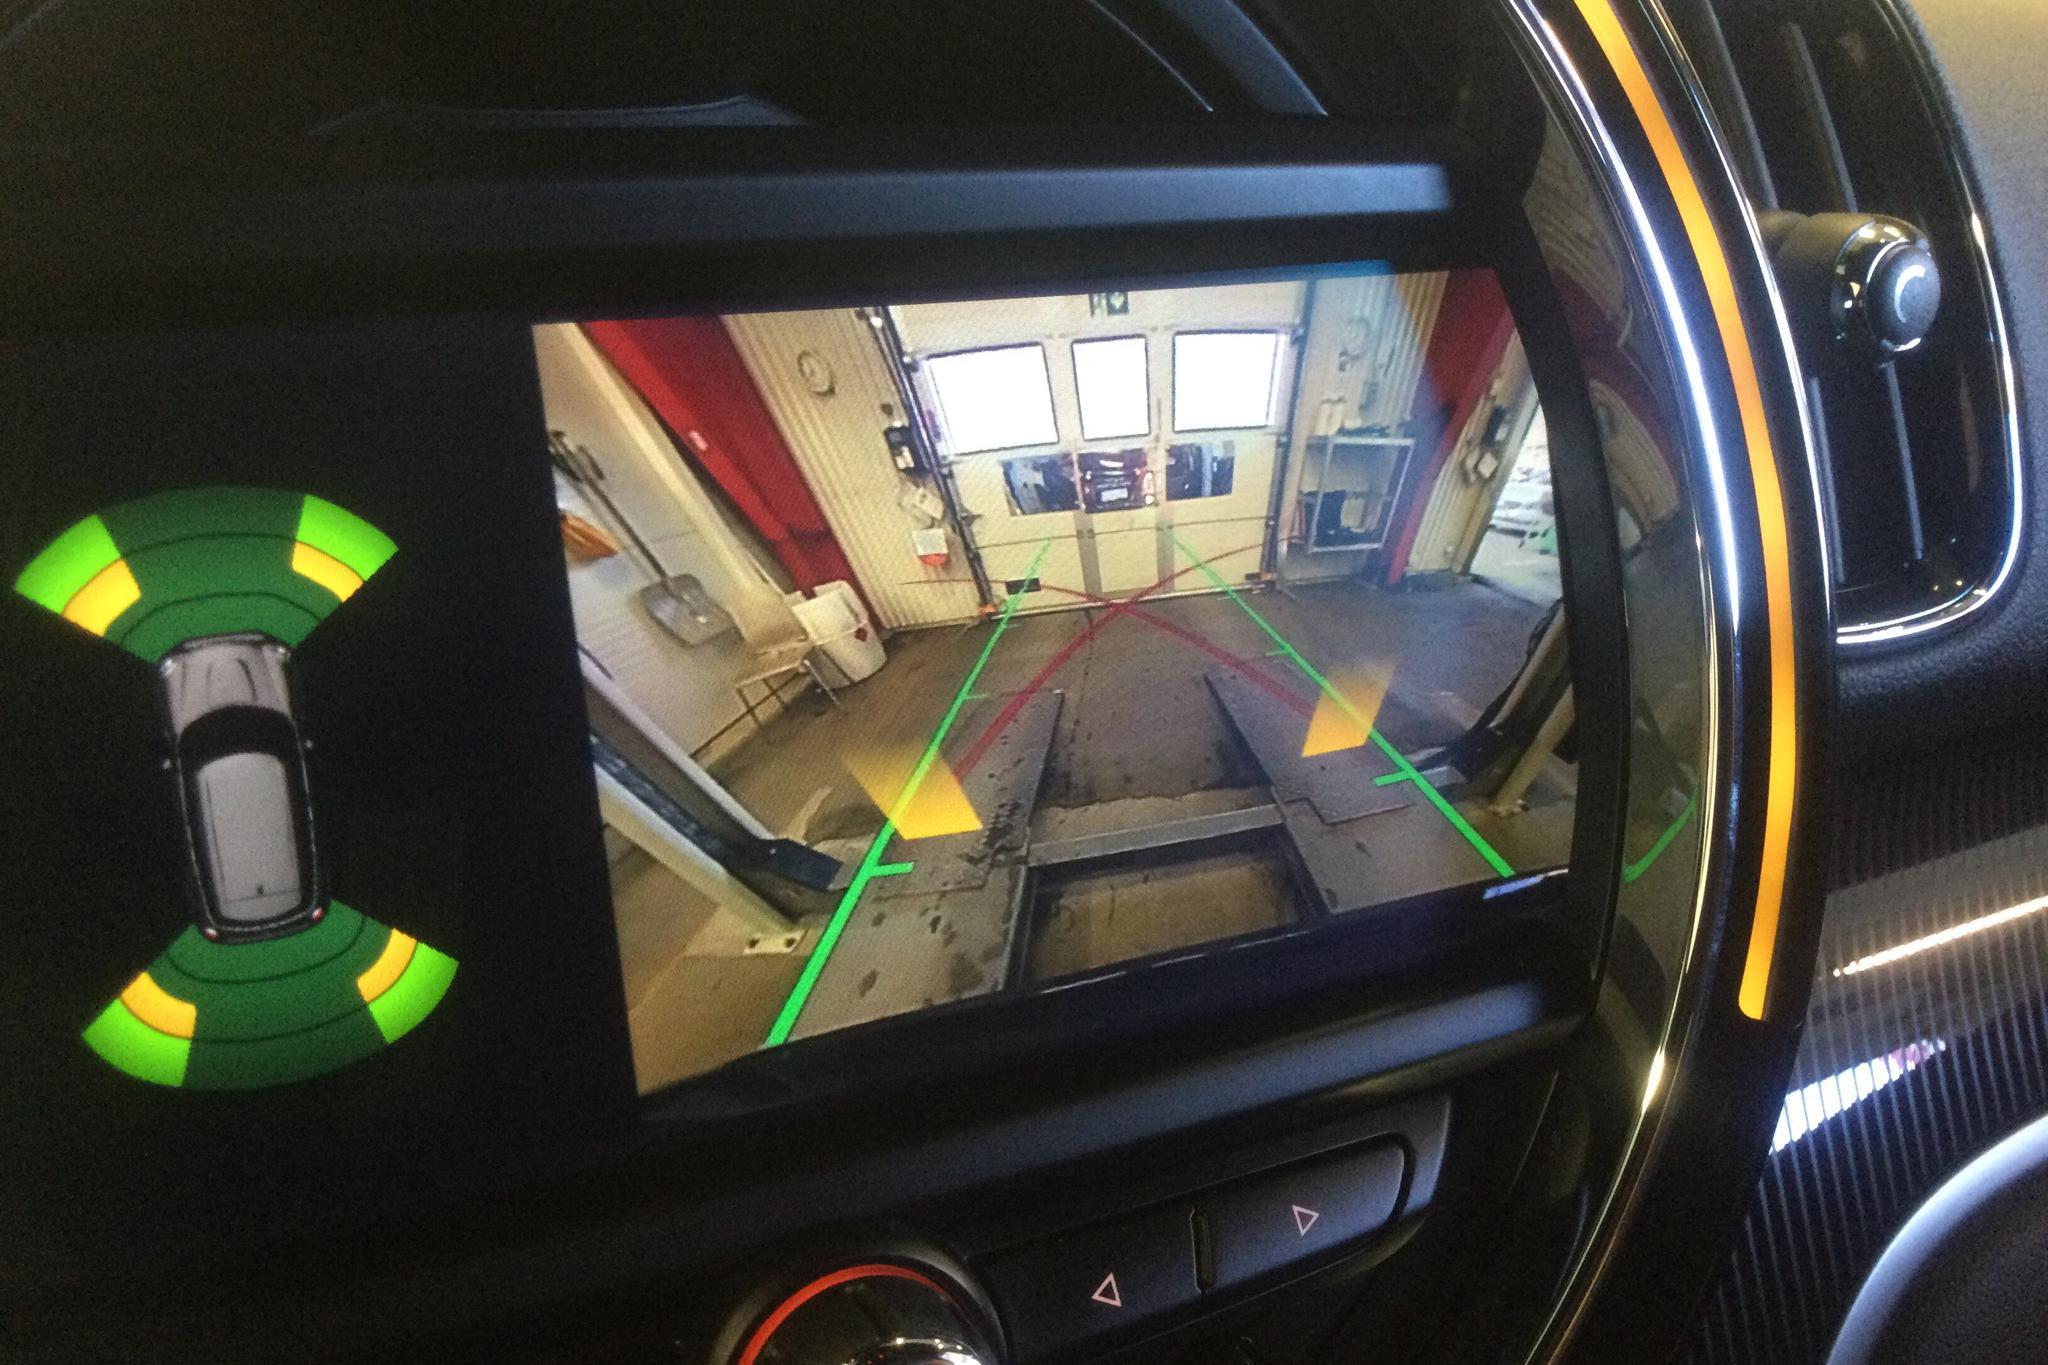 MINI Cooper S E ALL4 Countryman, F60 (224hk) - 2 509 mil - Automat - svart - 2020